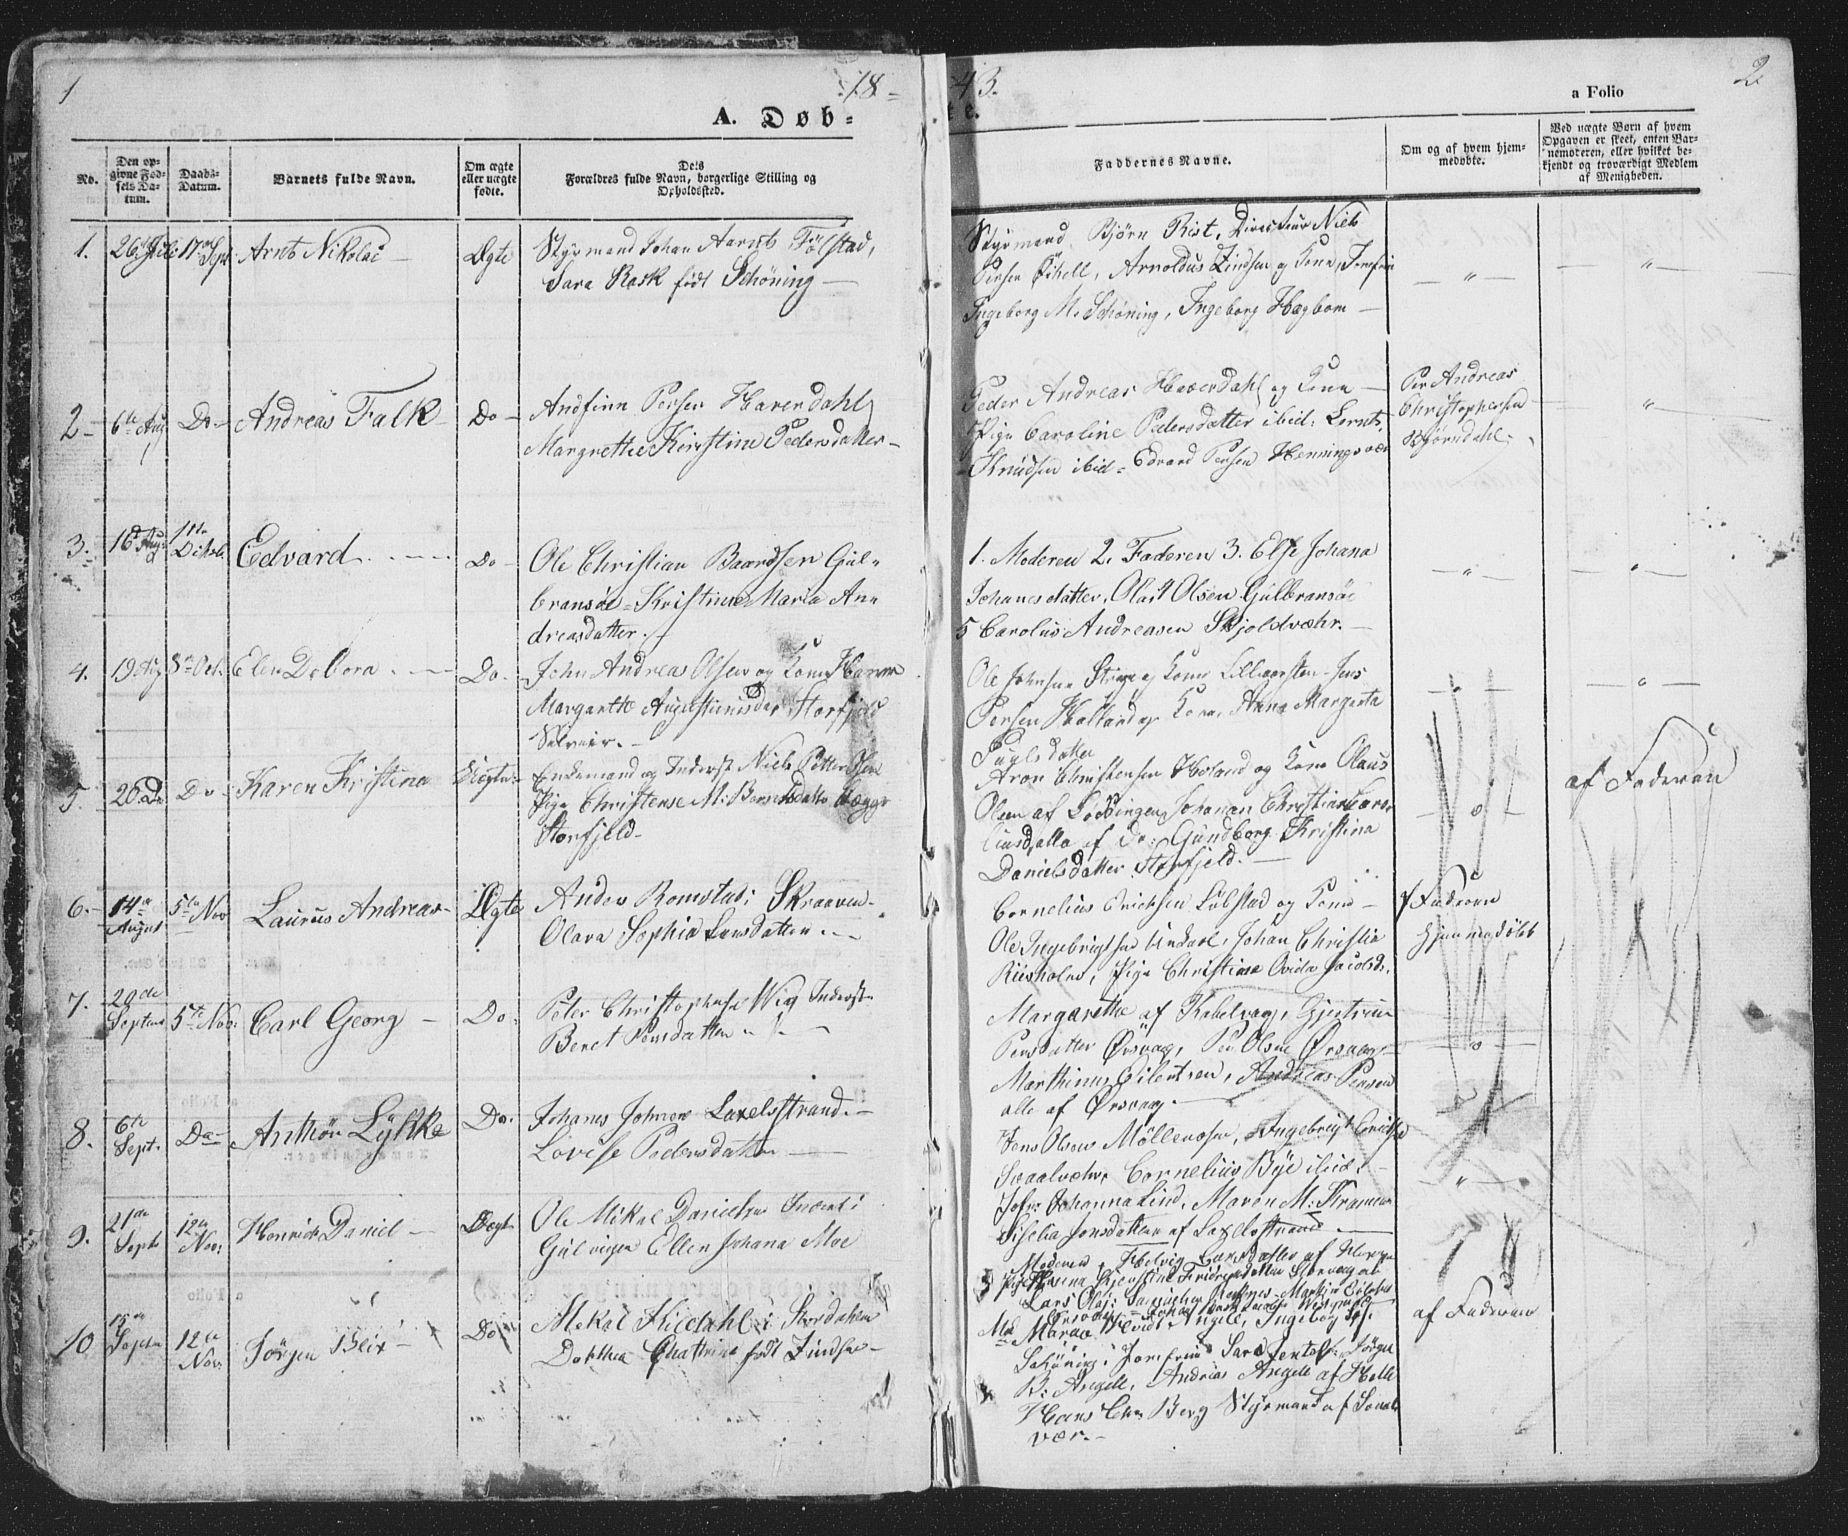 SAT, Ministerialprotokoller, klokkerbøker og fødselsregistre - Nordland, 874/L1072: Klokkerbok nr. 874C01, 1843-1859, s. 1-2